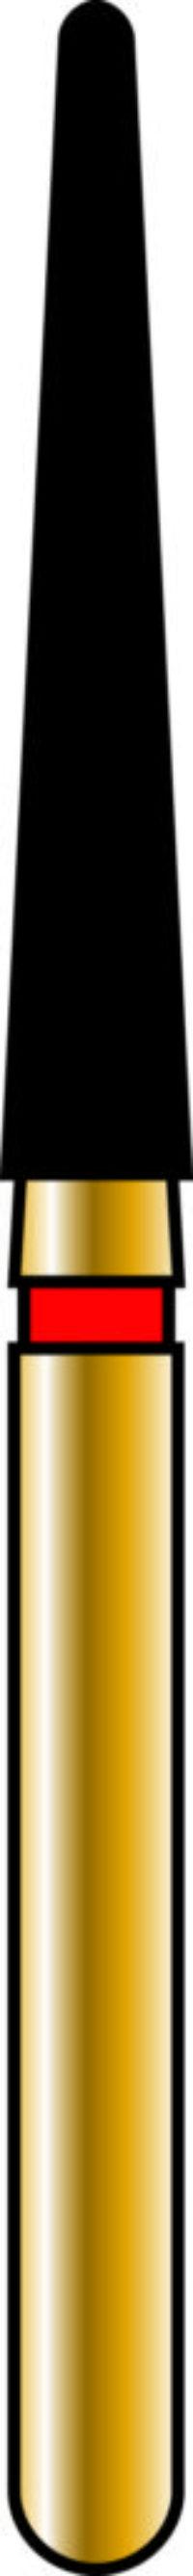 Round End Taper 18-11mm Gold Diamond Bur